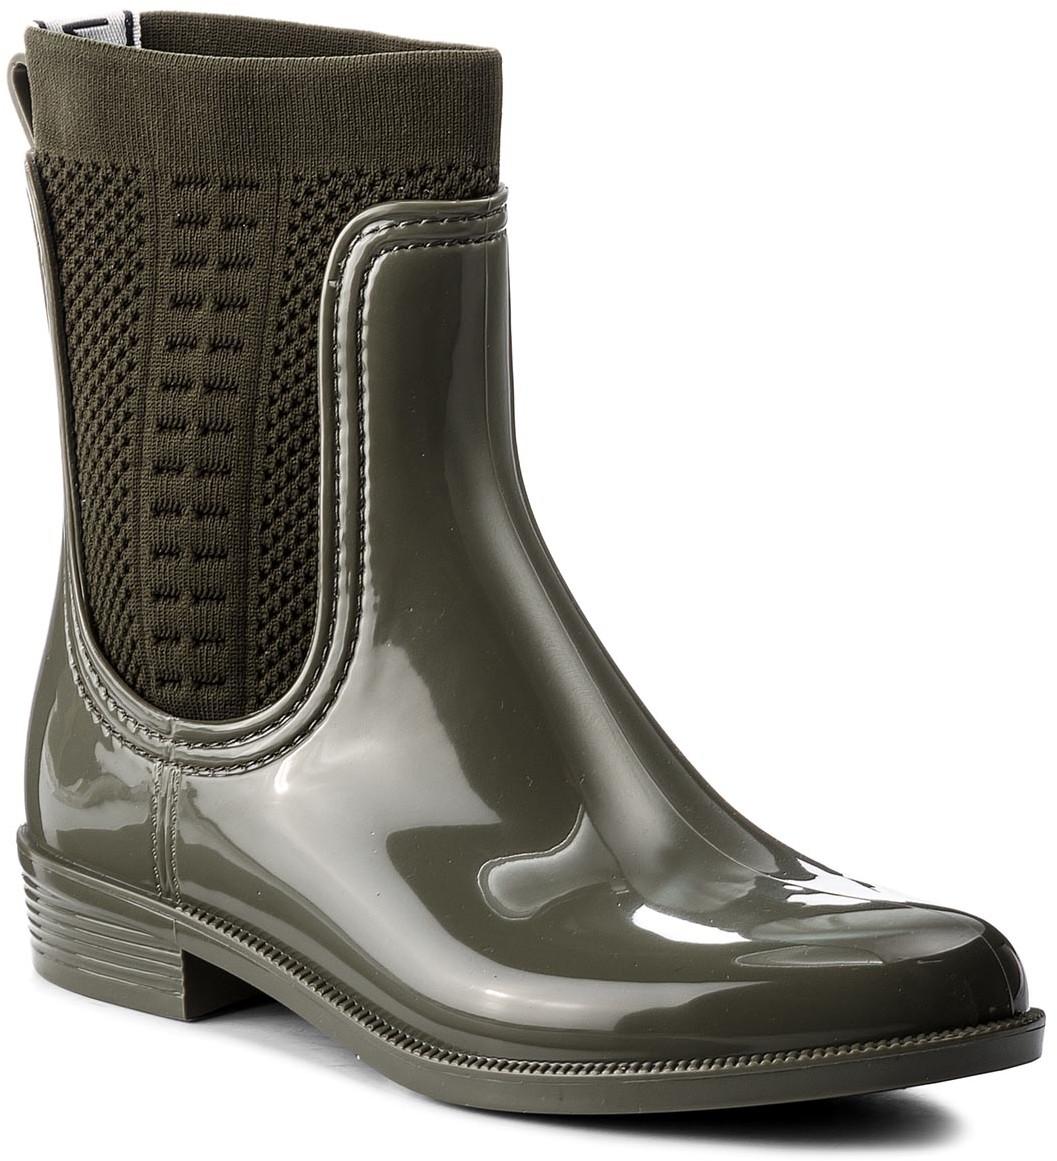 6cf11cffc07c6 Tommy Hilfiger Kalosze Tommy Knit Rain Boot FW0FW02940 Dusty Olive 0110